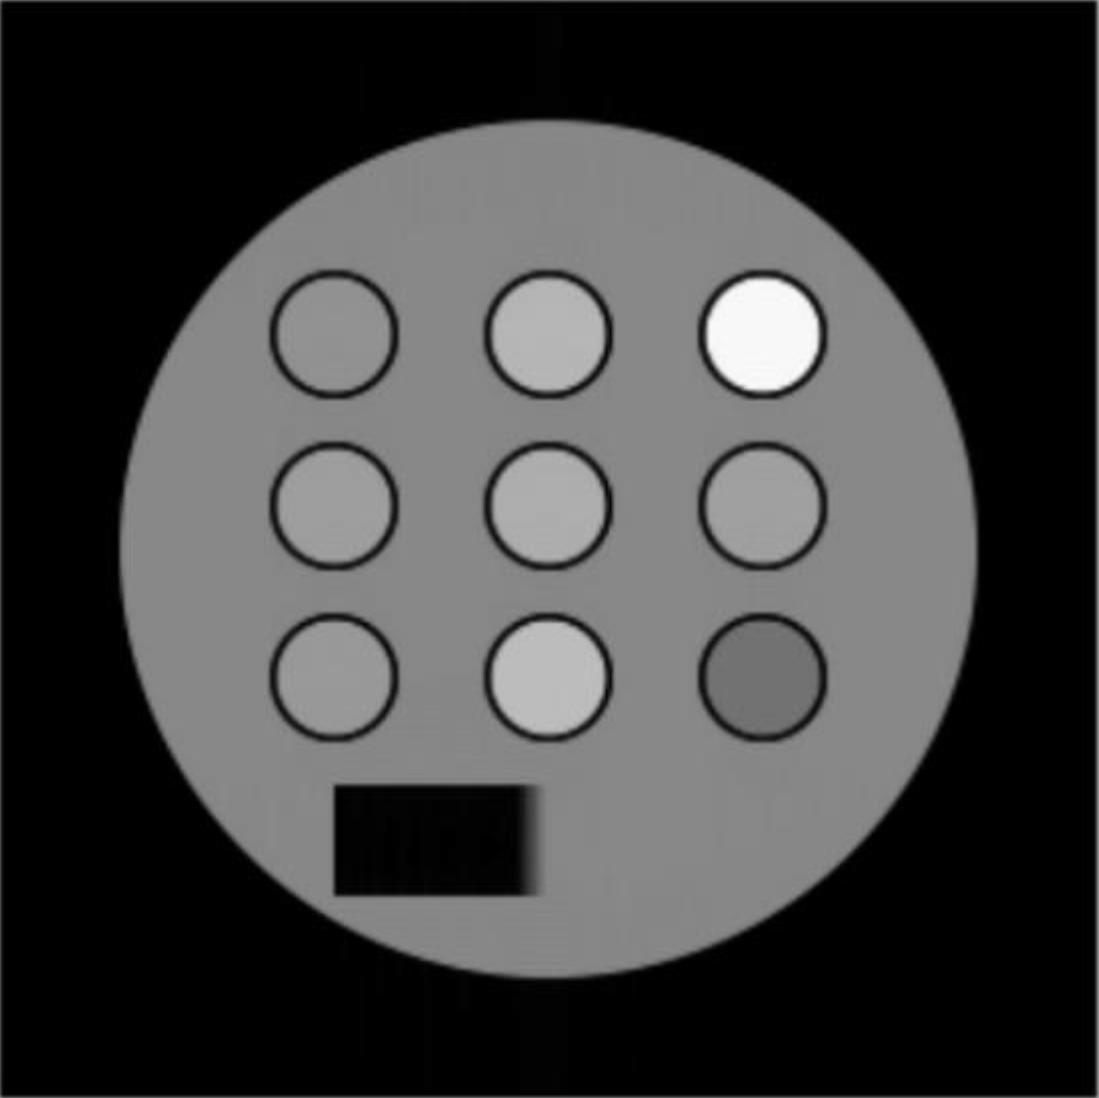 f:id:radmodel:20200510012505p:plain